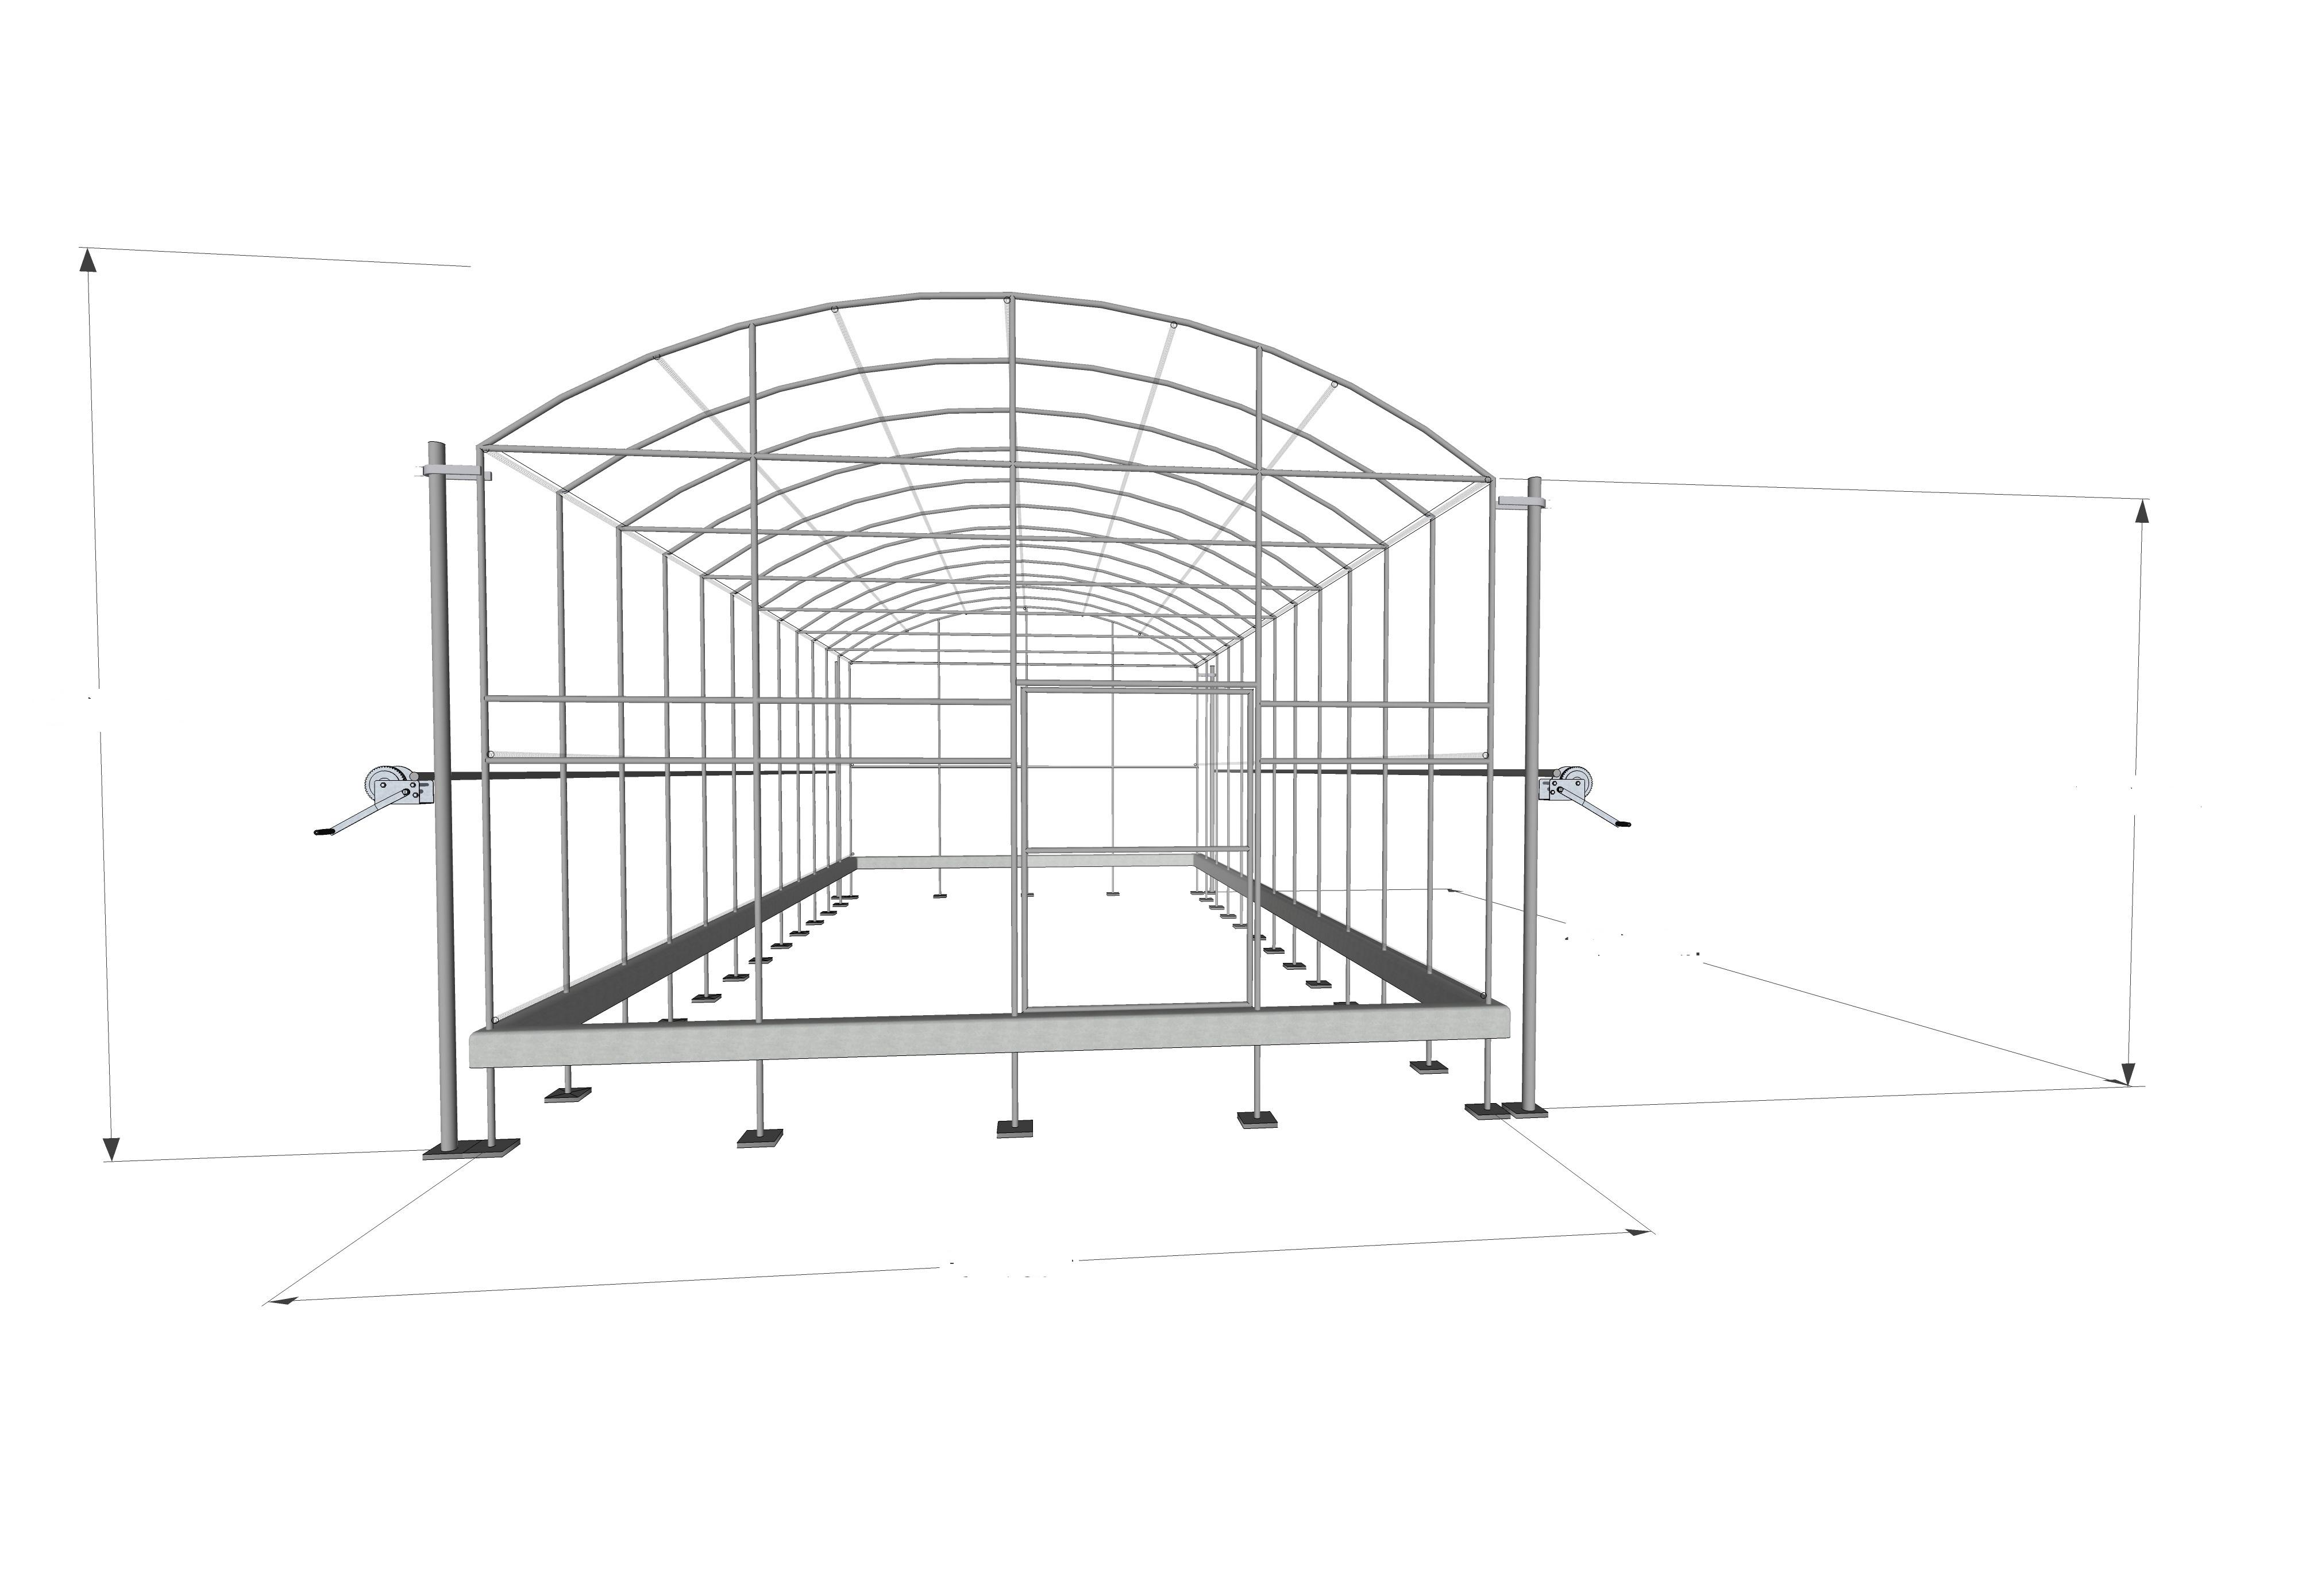 greenhouse design.jpg